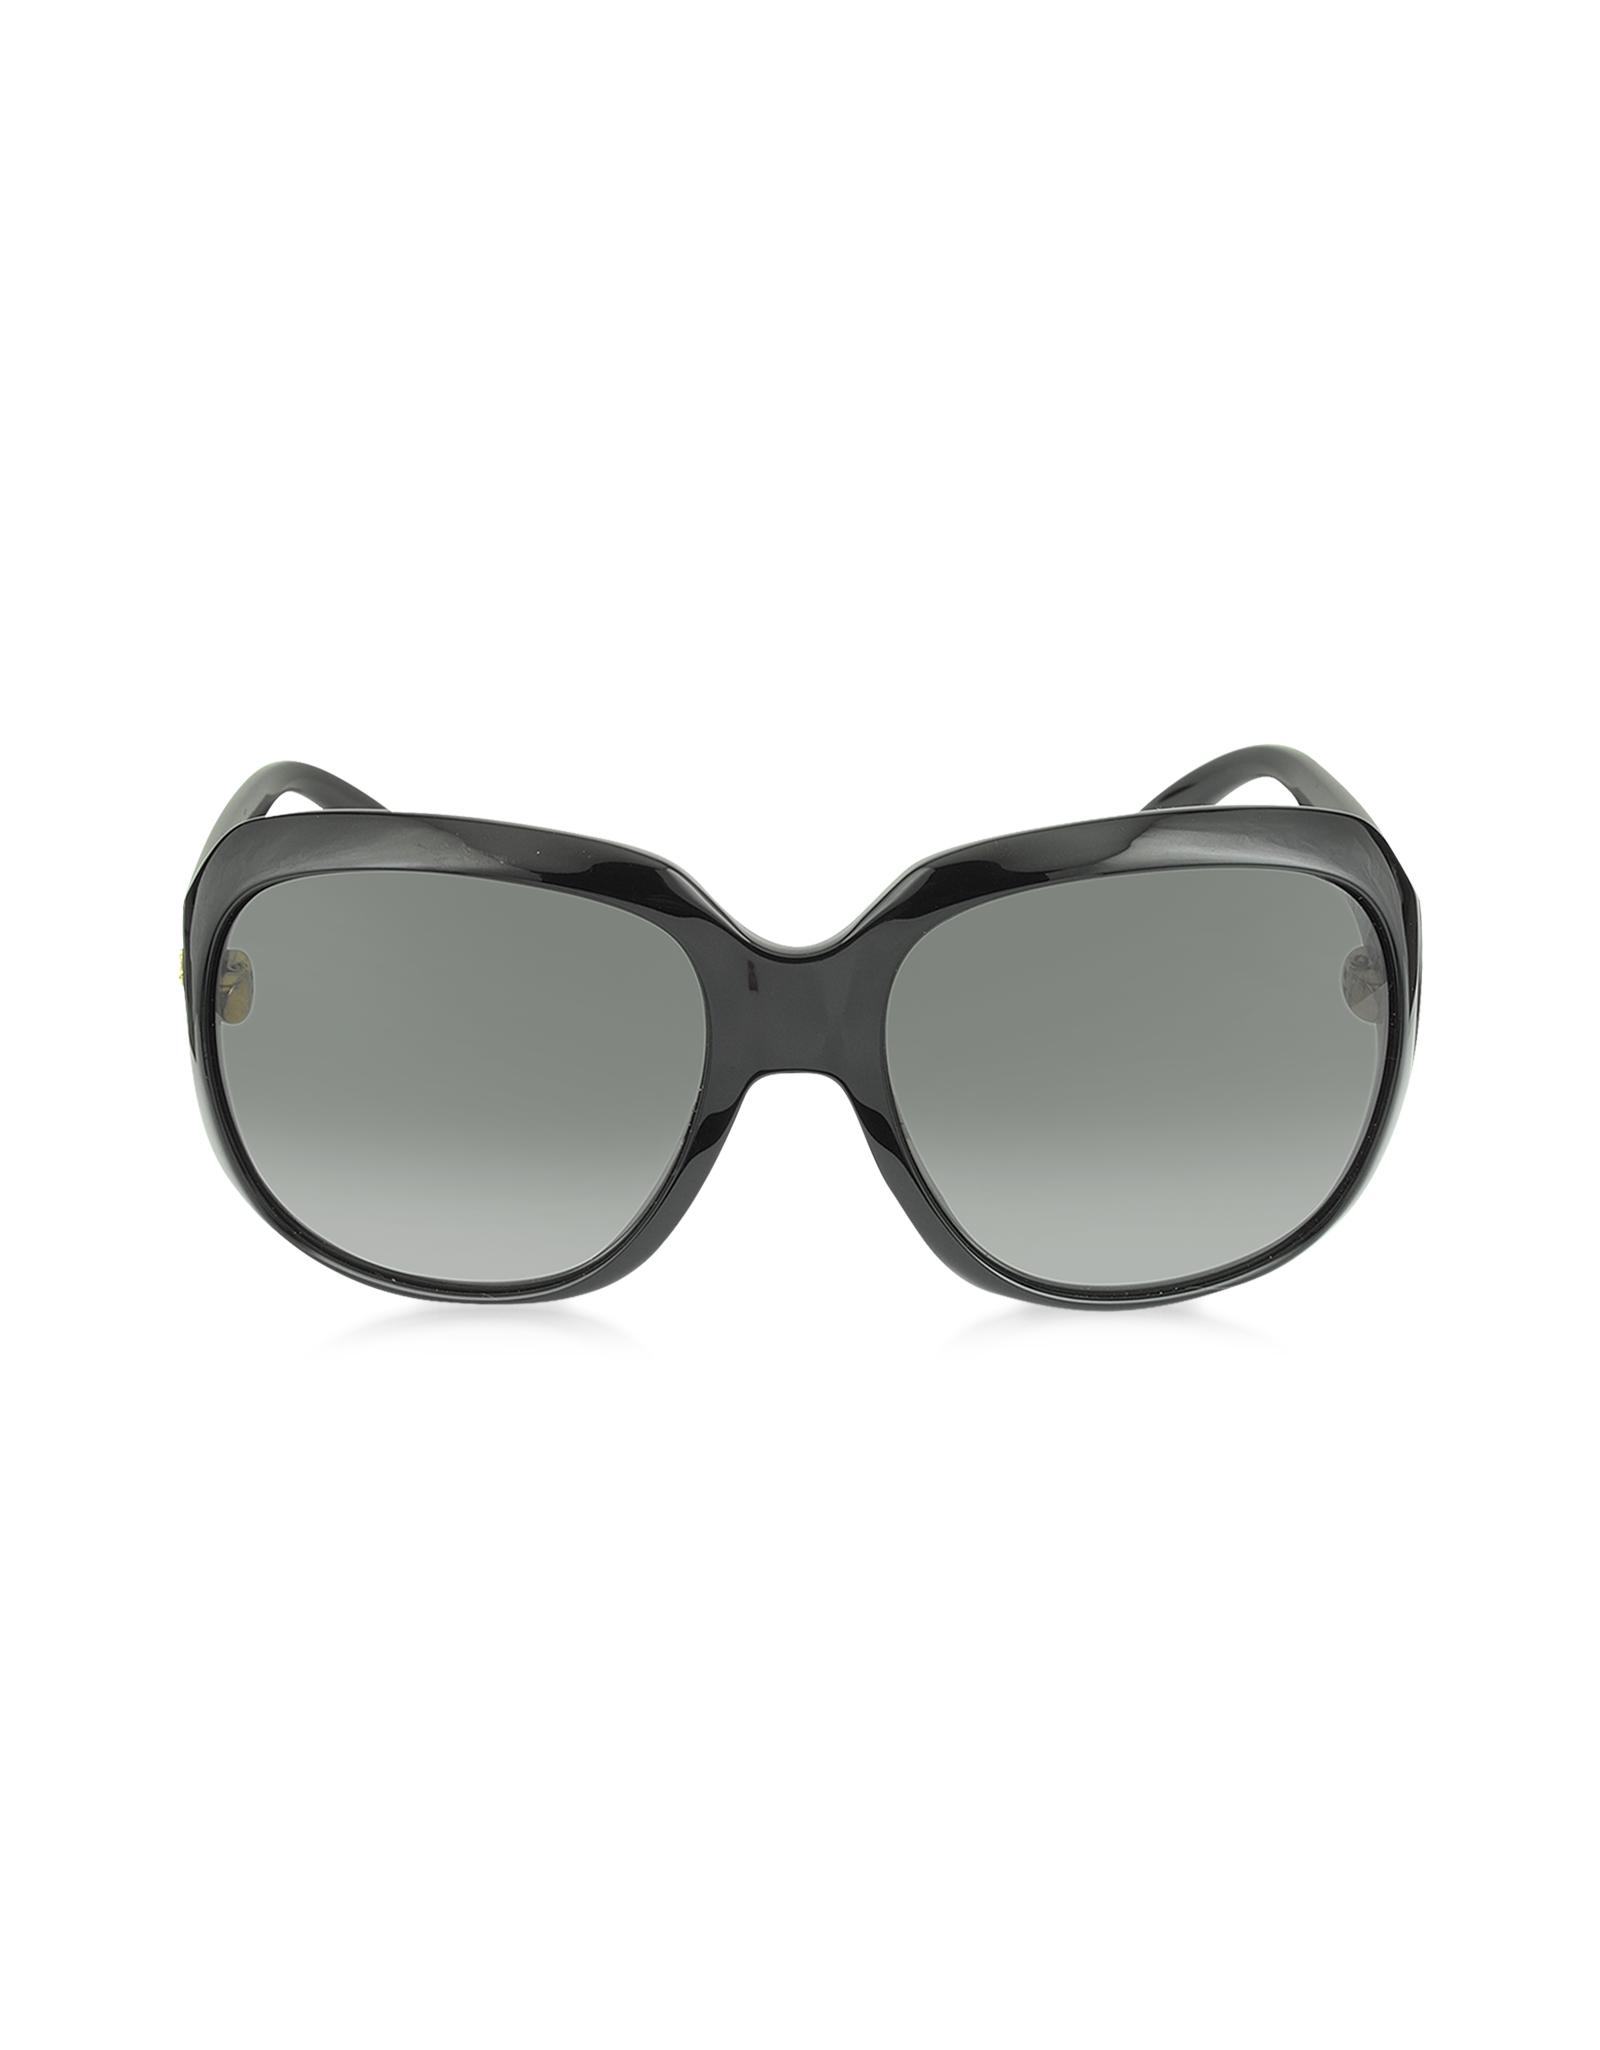 Gucci Bamboo Sunglasses - Marie France Asia, women's magazine  |Gucci Sunglasses Women 2013